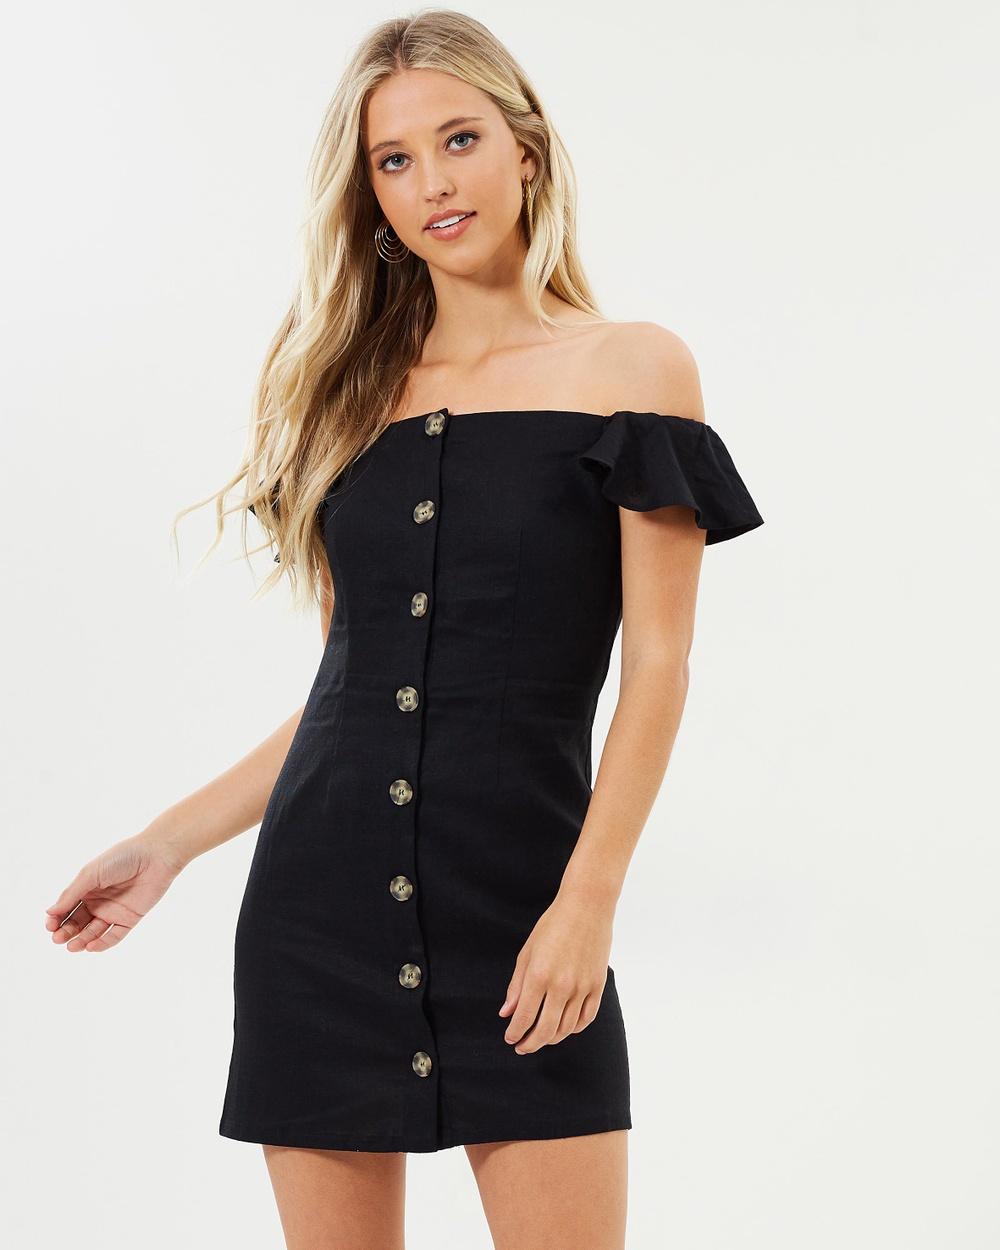 Miss Selfridge Button Bardot Dress Dresses Black Button Bardot Dress